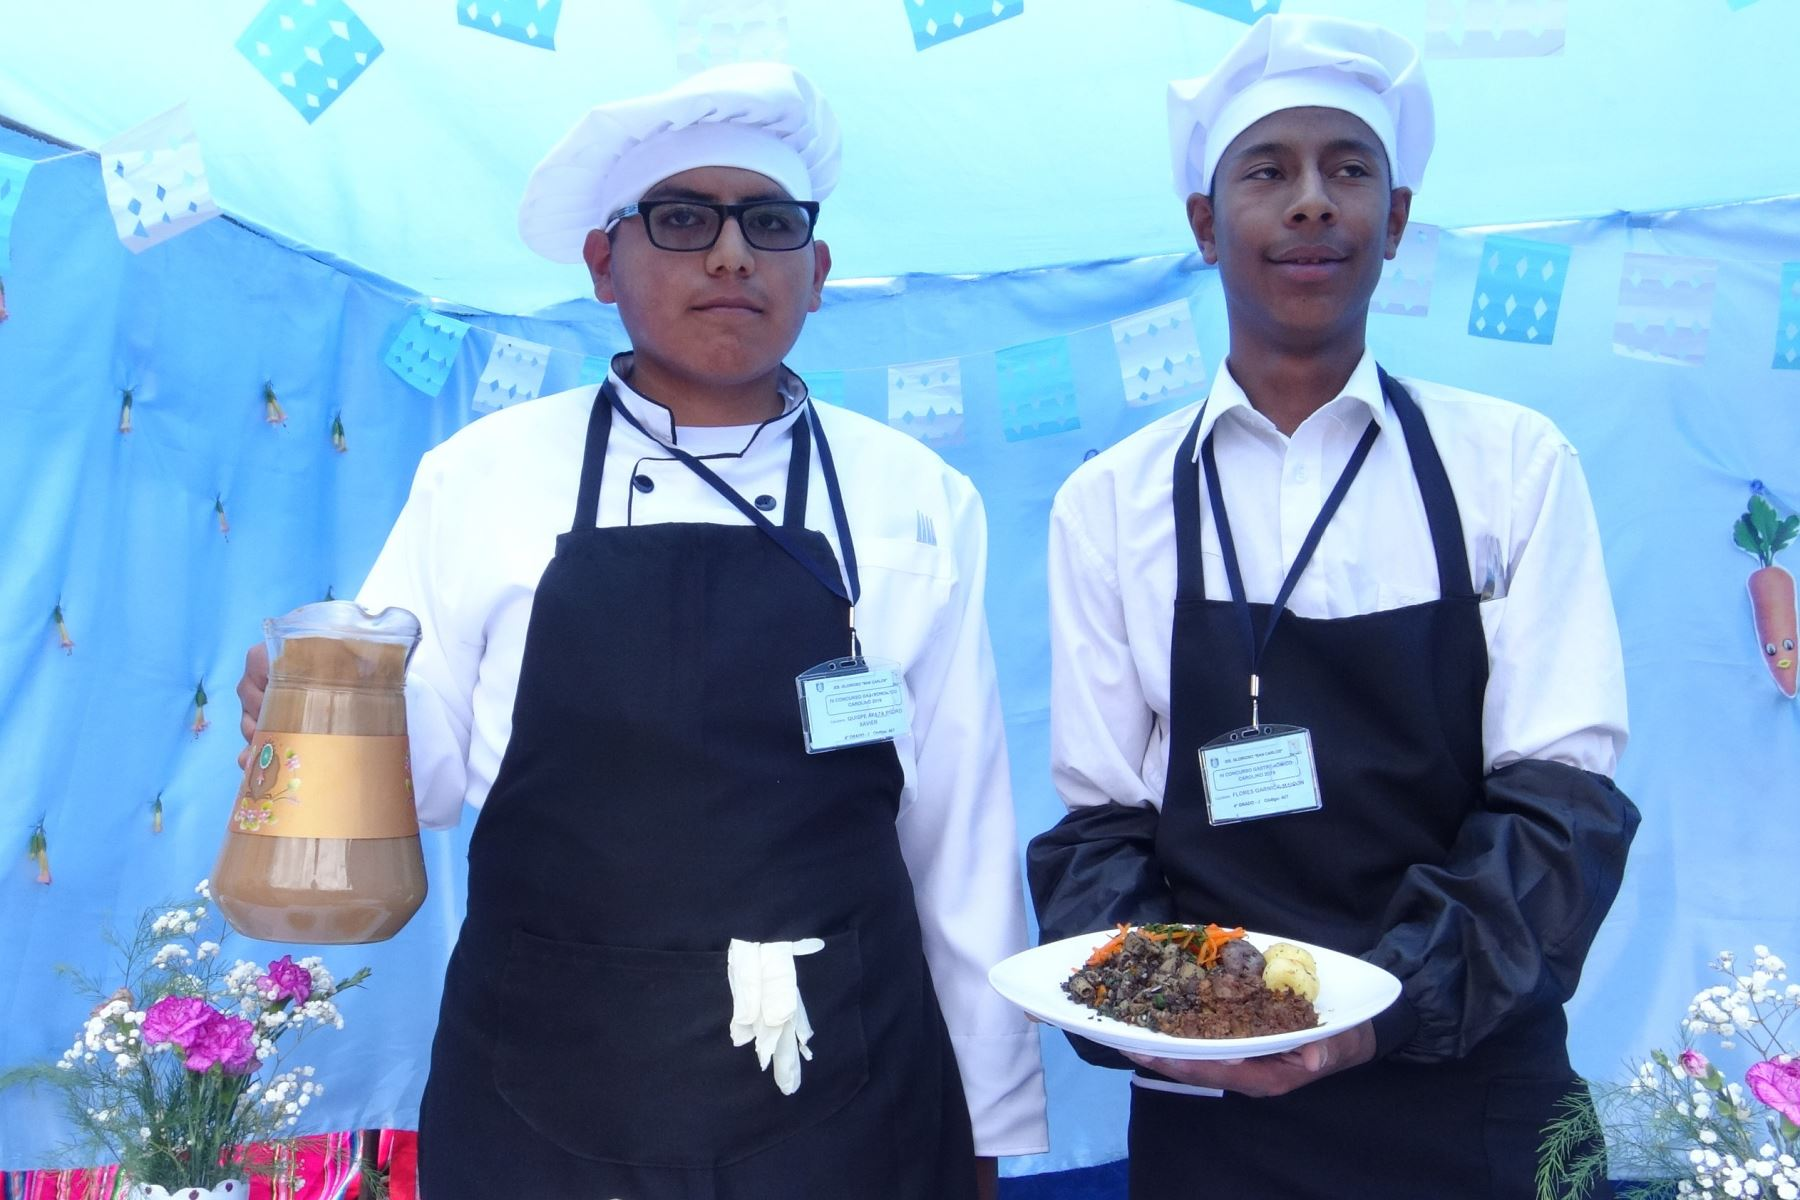 Escolares de Puno crean manjar de hígado de pollo para combatir la anemia infantil. ANDINA